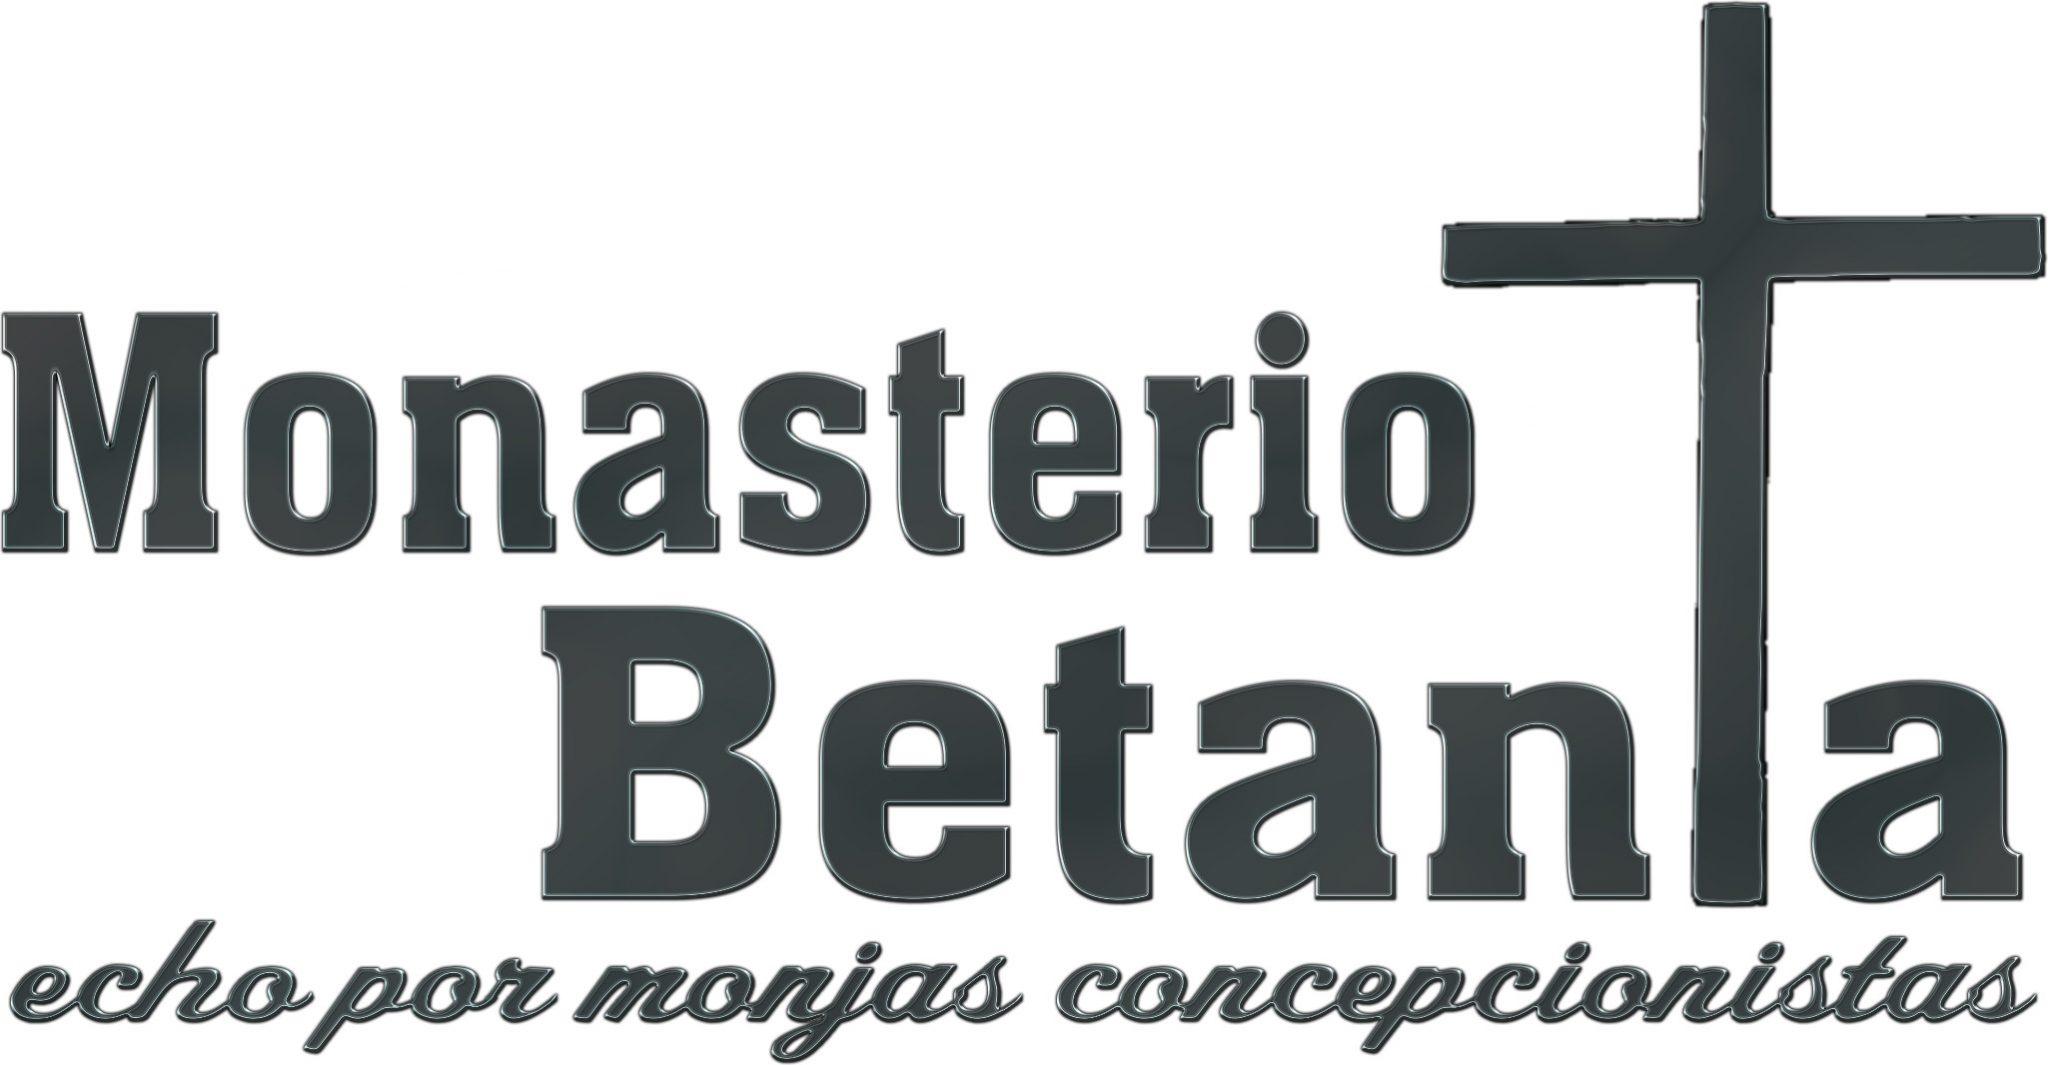 Monasterio Betania